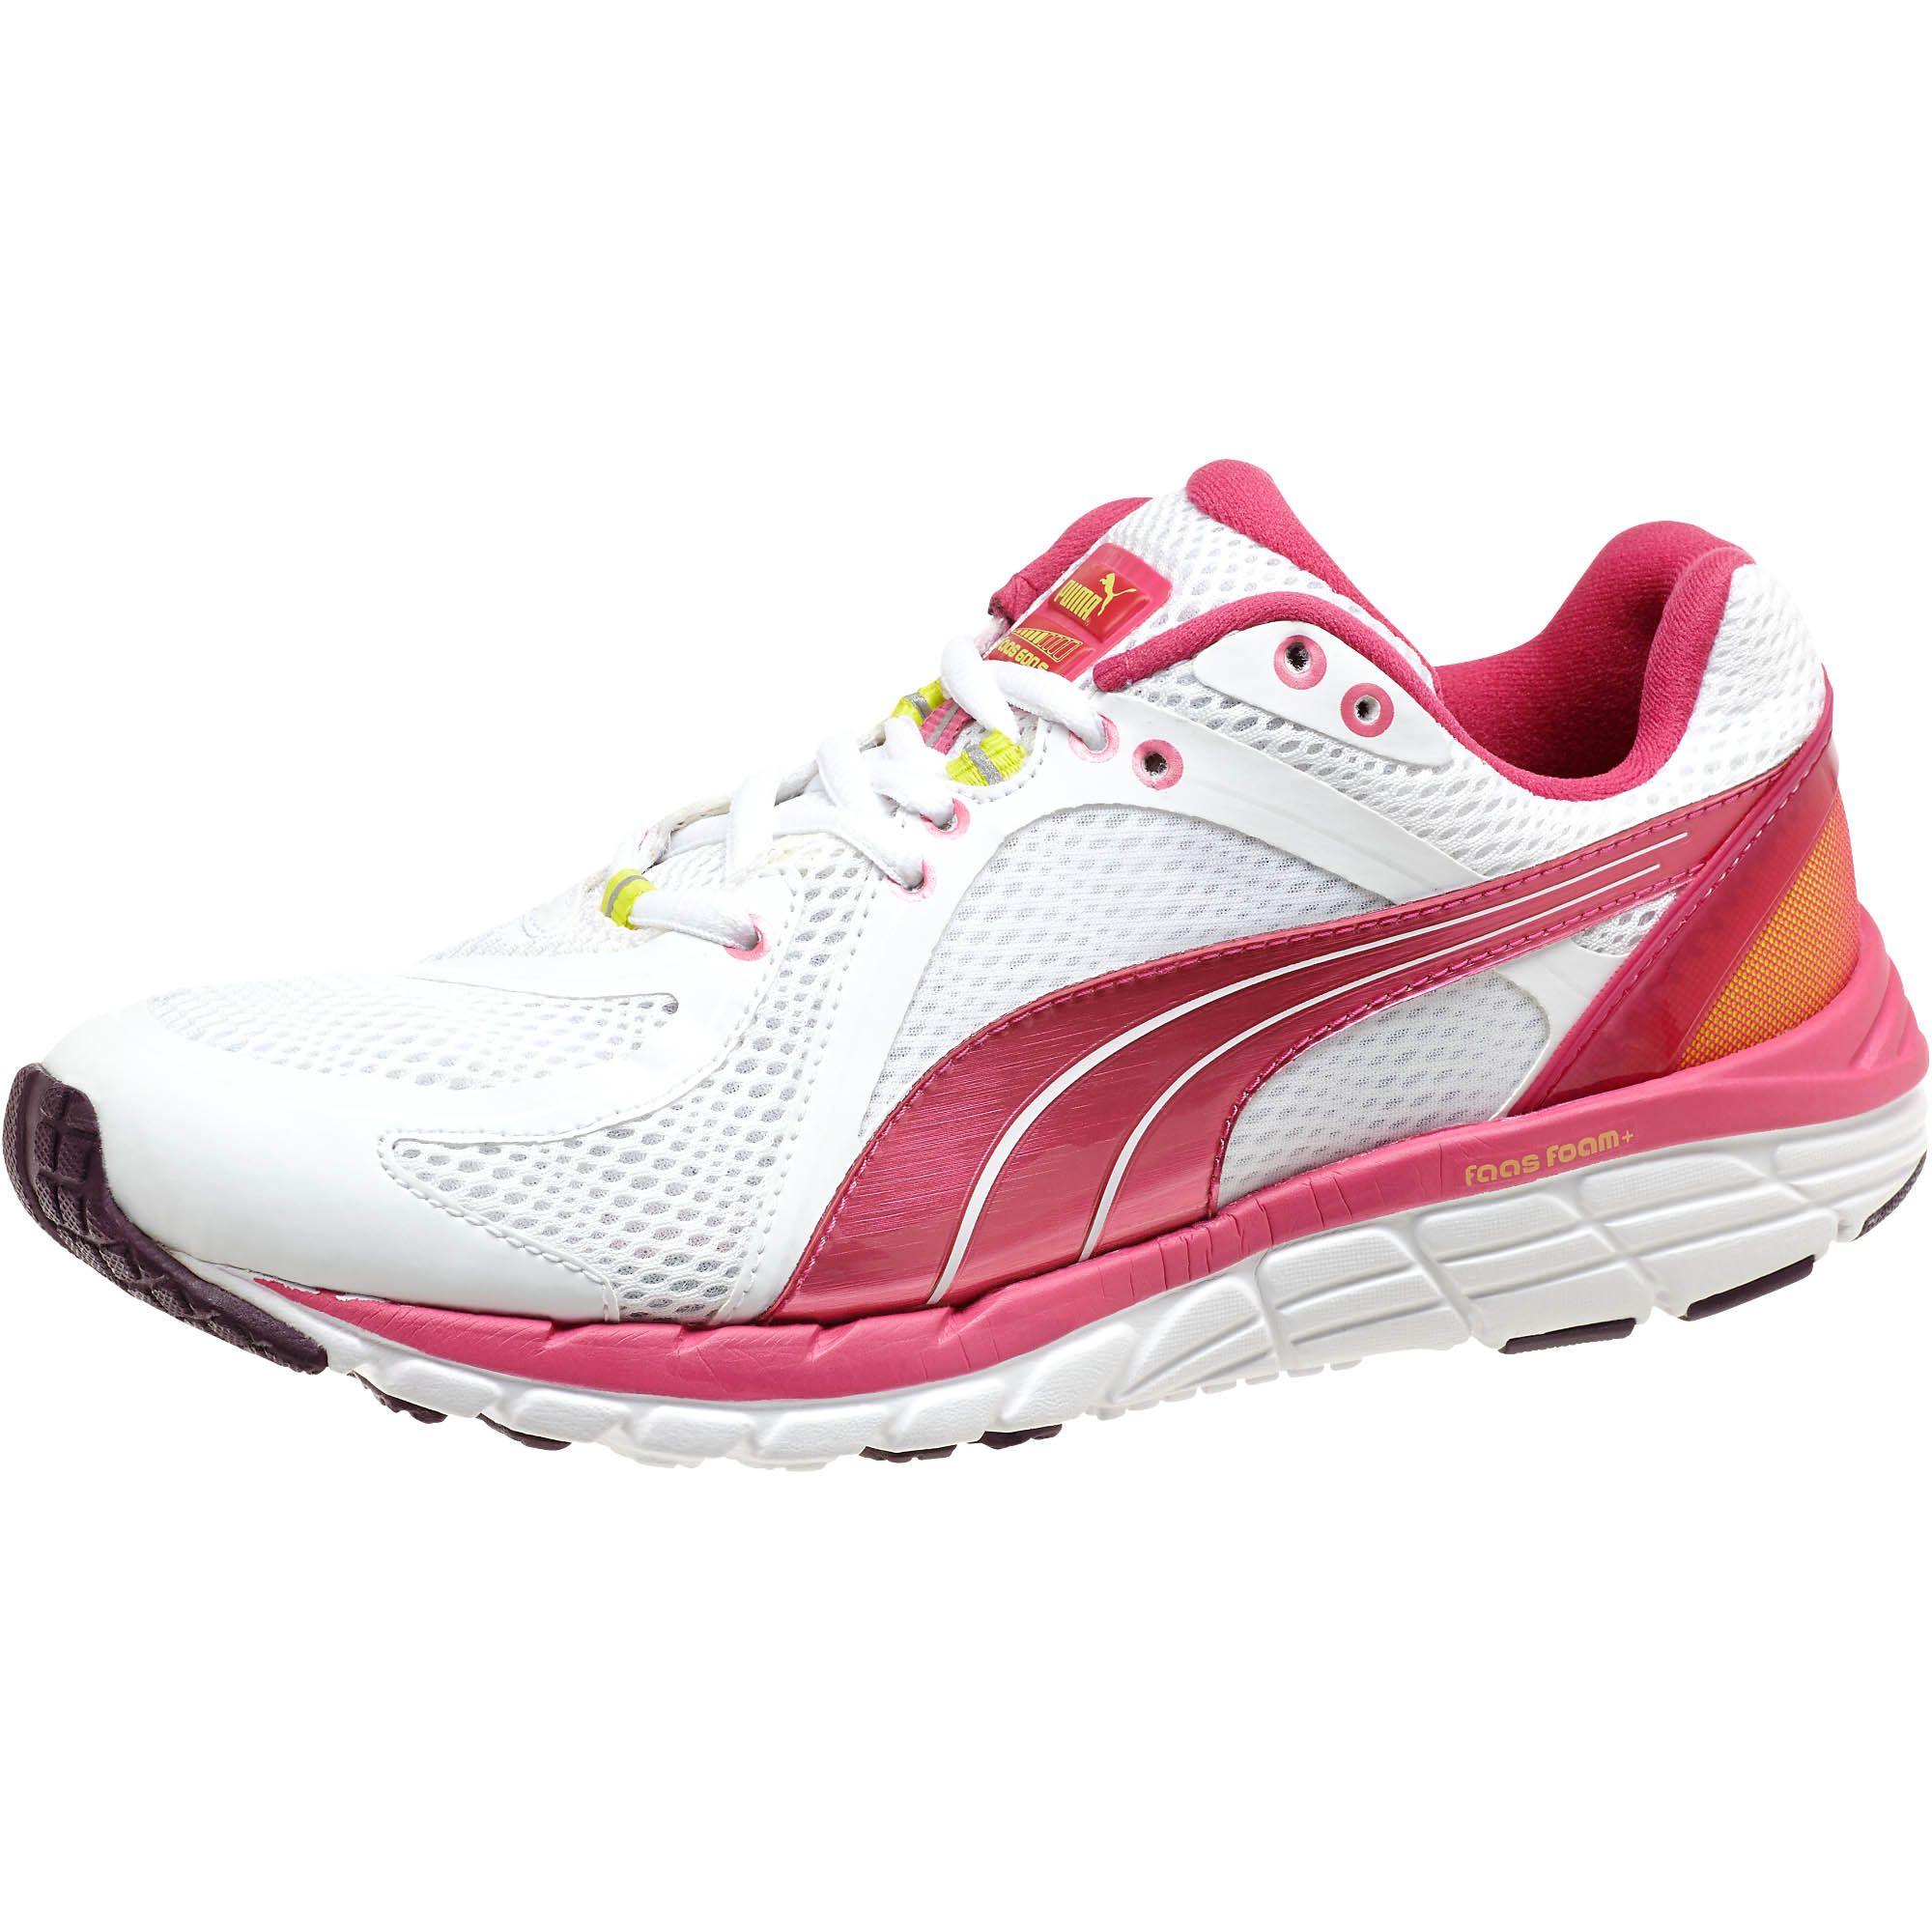 Faas 600 S Women's Running Shoes